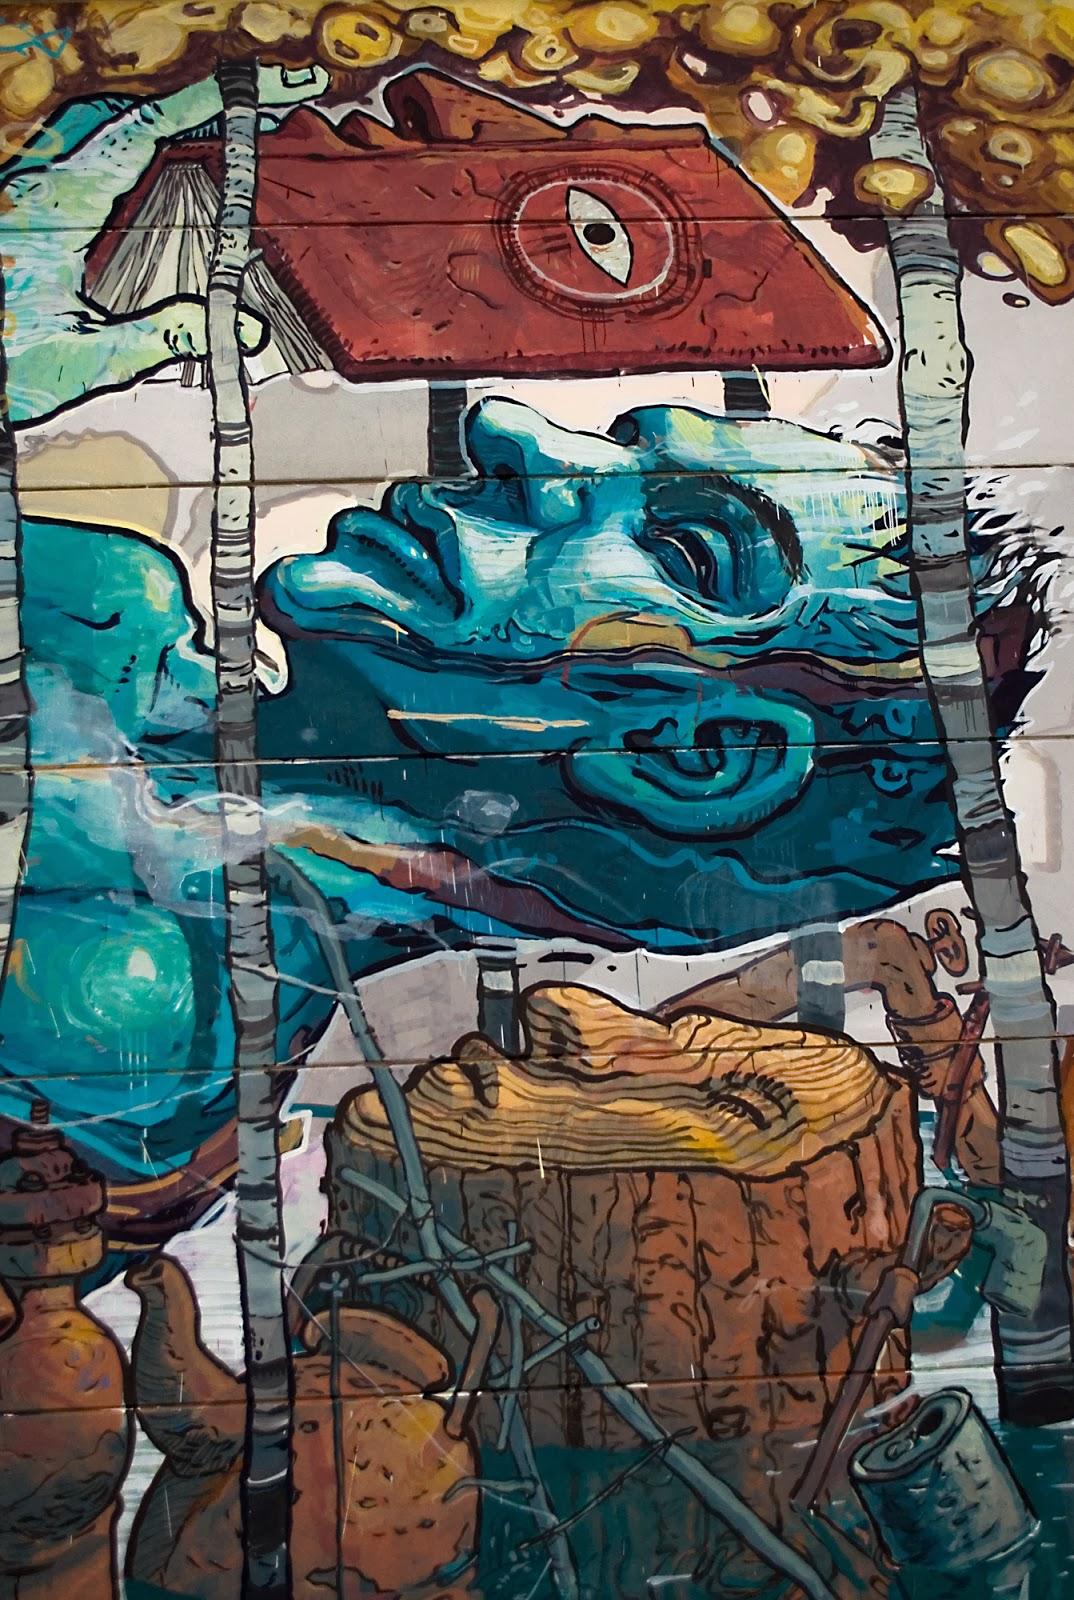 Riquiño-new-mural-at-desordes-creativas-2013-06